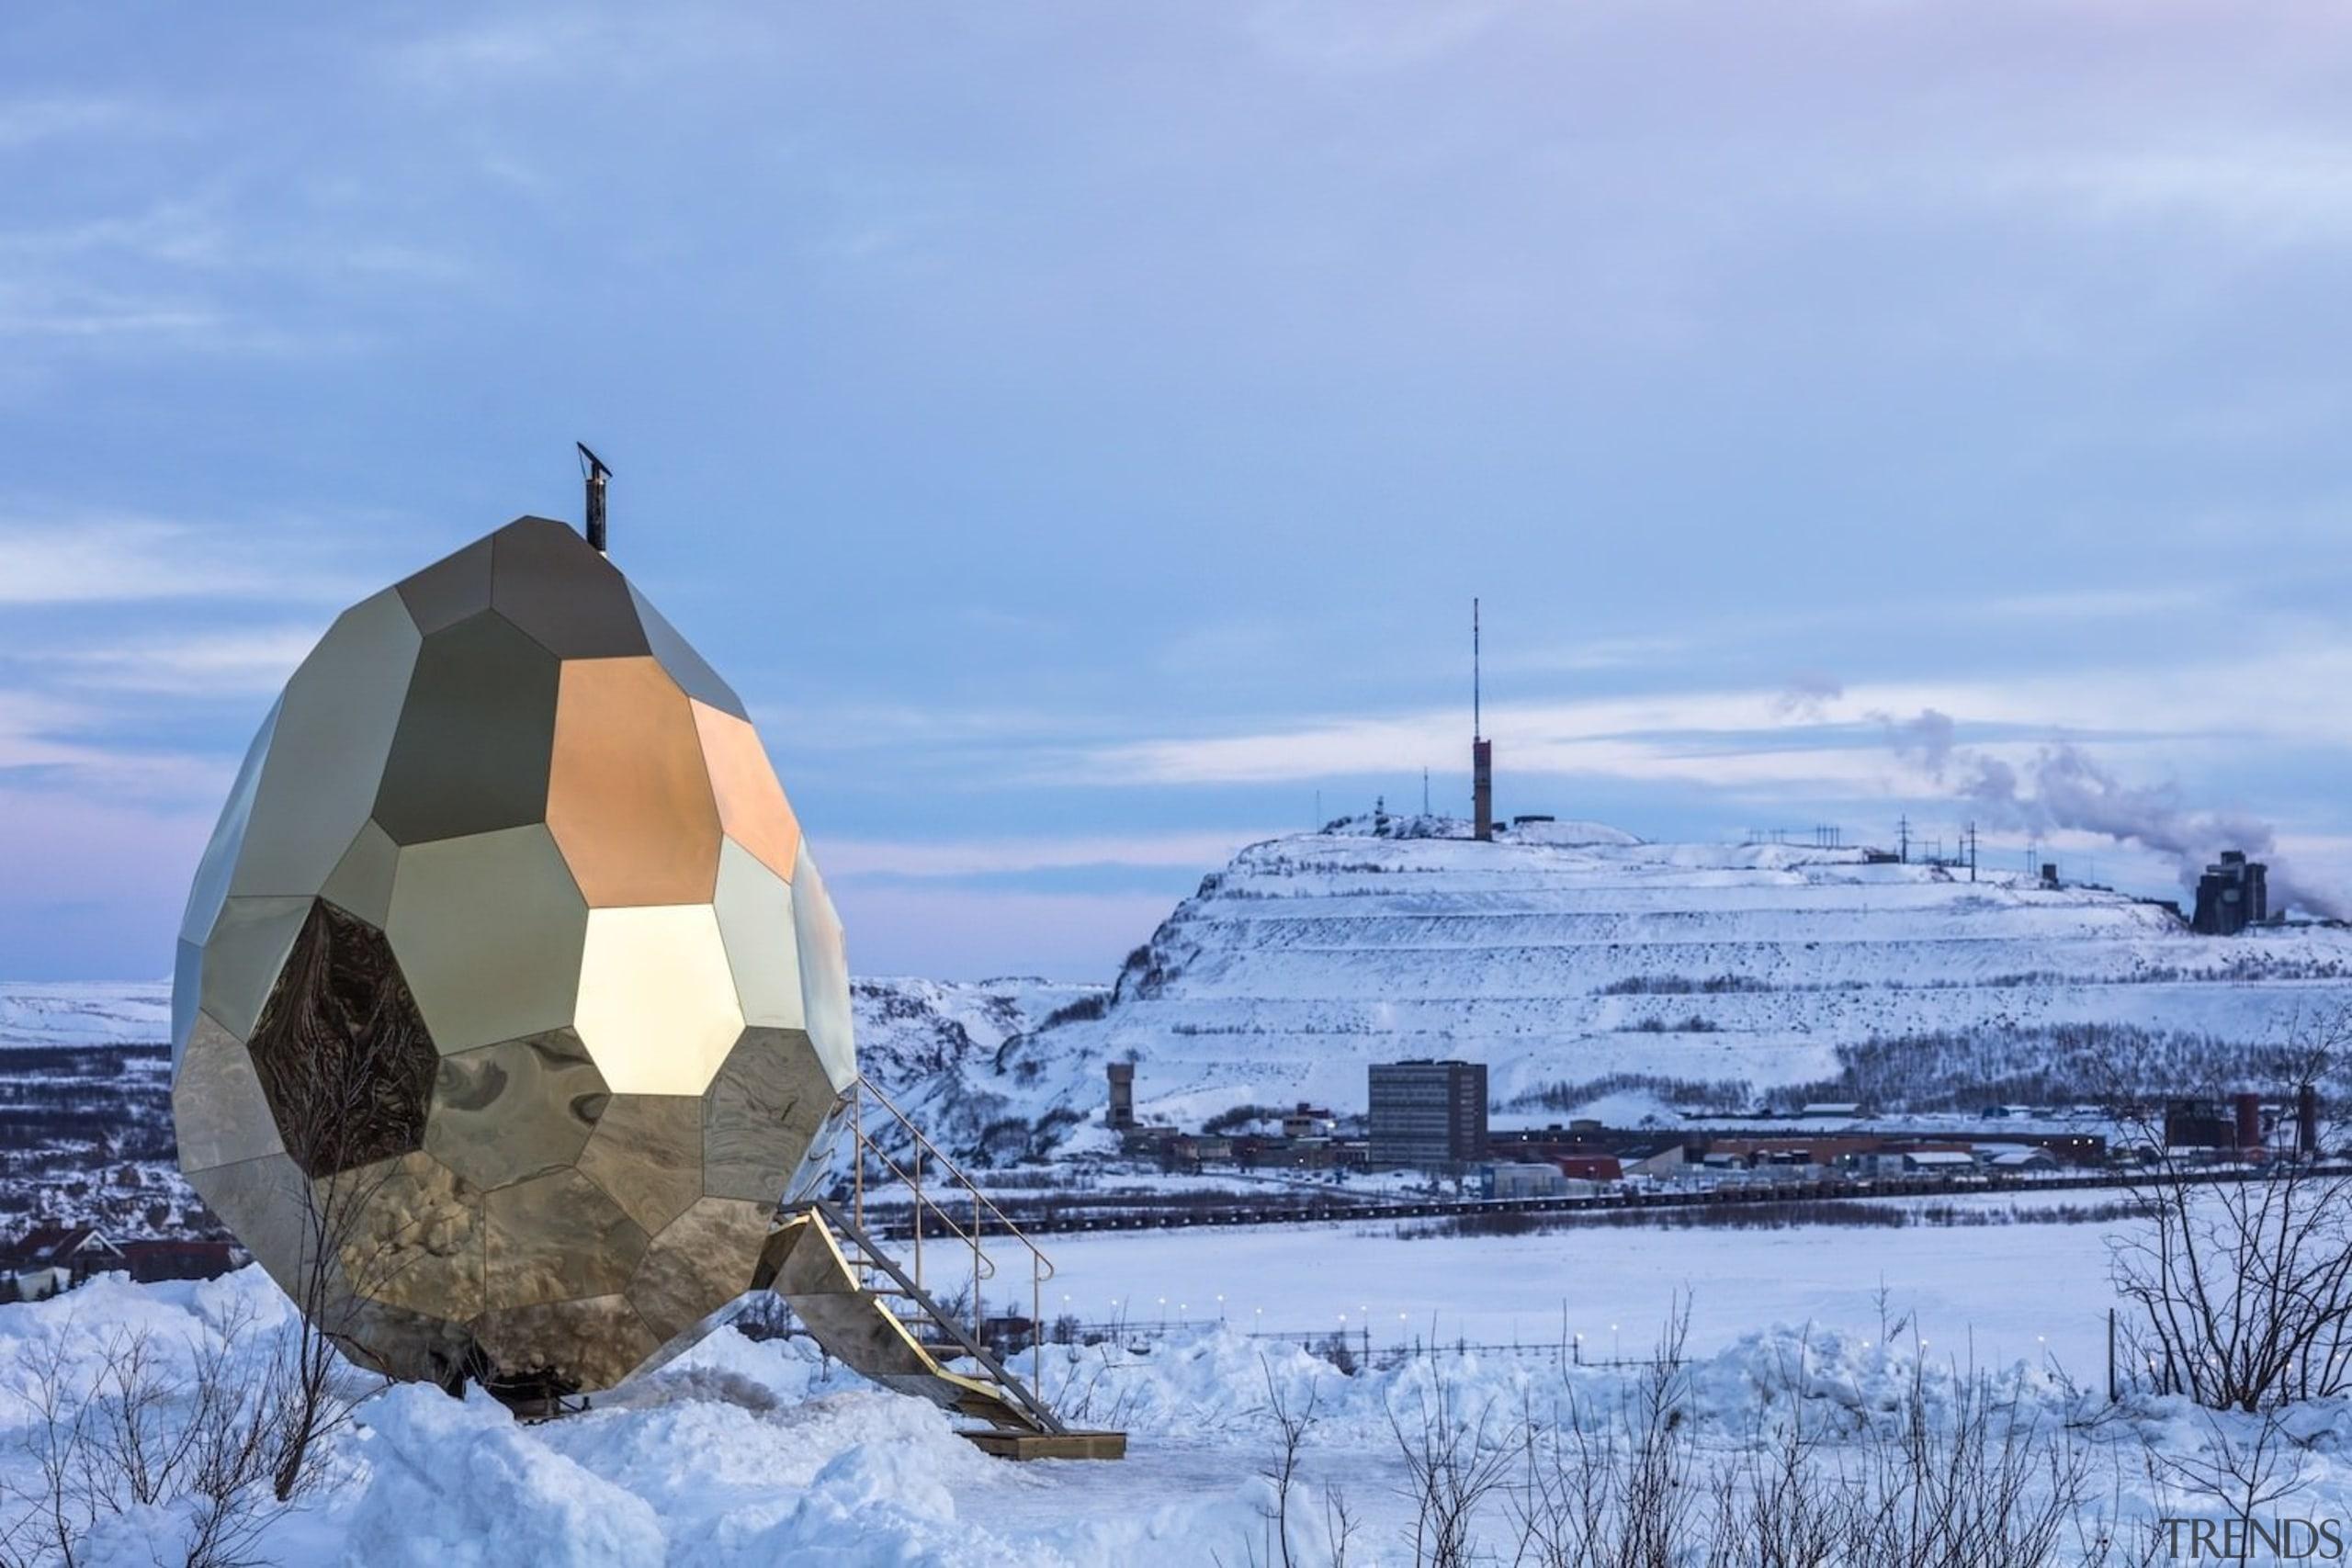 Designed by Bigert & BergströmPhotography by Jean-Baptiste arctic, freezing, ice, sky, snow, winter, teal